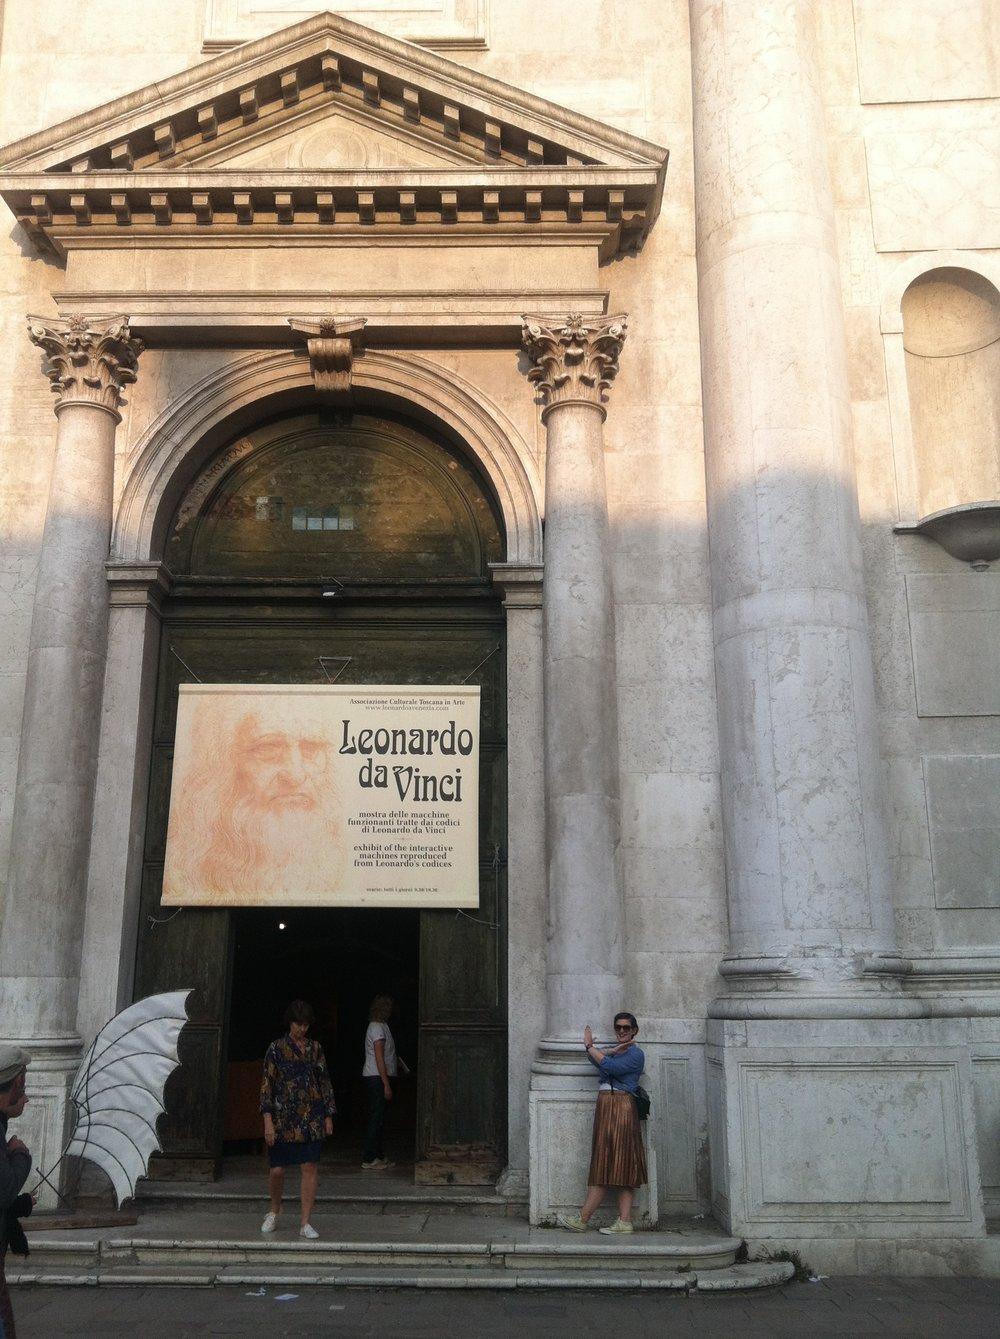 Following Dr. Indiana Jones In Venice